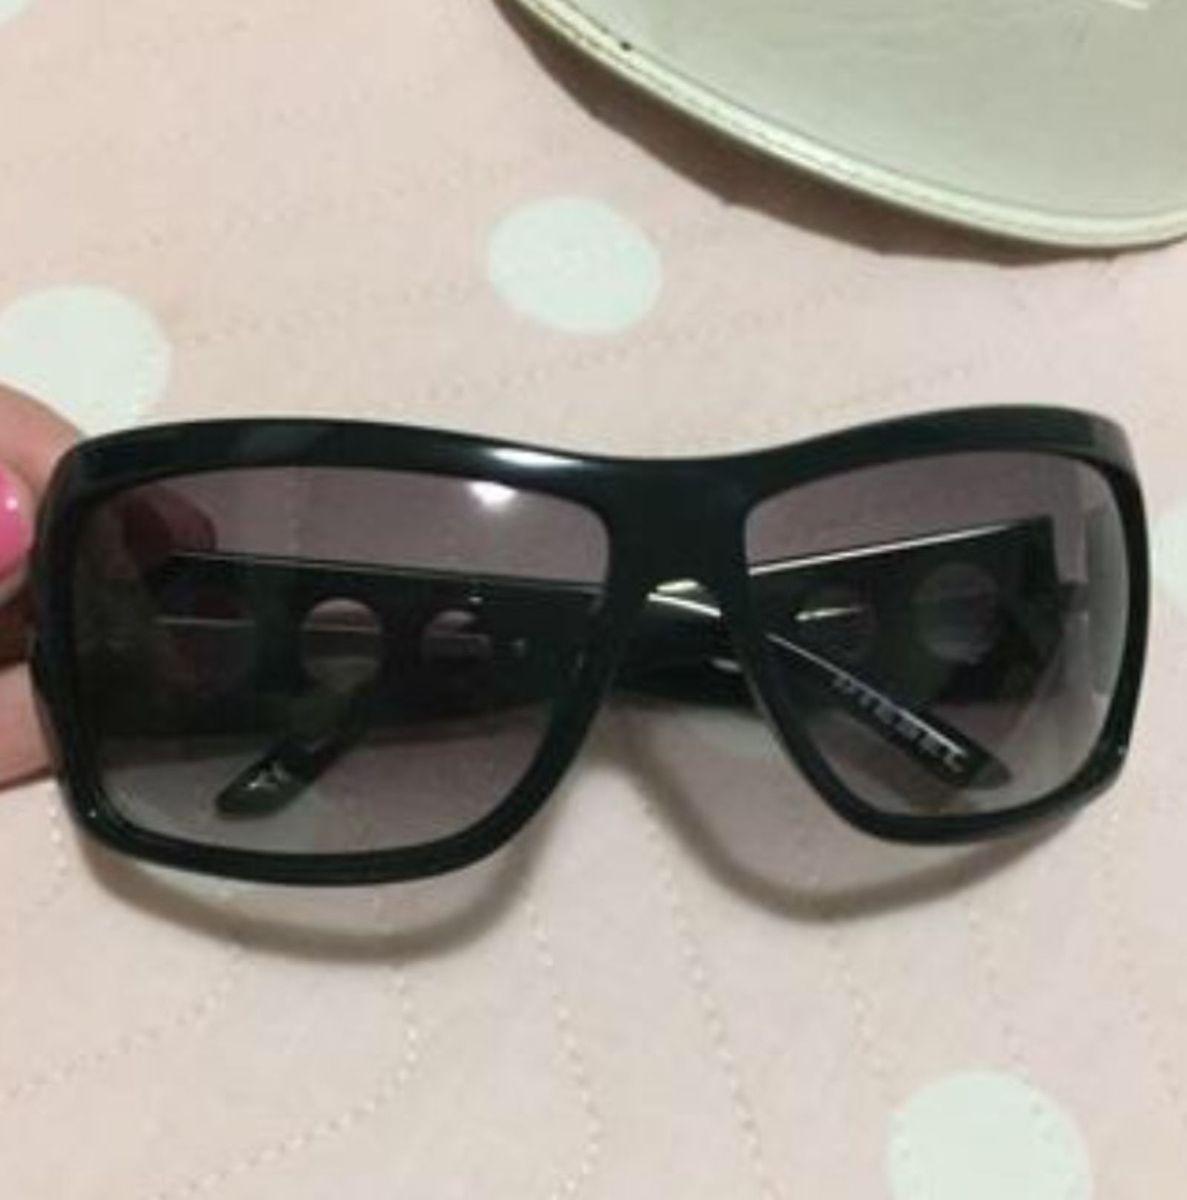 326b3ab49 óculos de sol diesel com estojo - óculos diesel.  Czm6ly9wag90b3muzw5qb2vplmnvbs5ici9wcm9kdwn0cy80nte1otq2l2e4n2uzzdzlzjziy2jjmjbkndyxndjlm2m3ntewmzzmlmpwzw